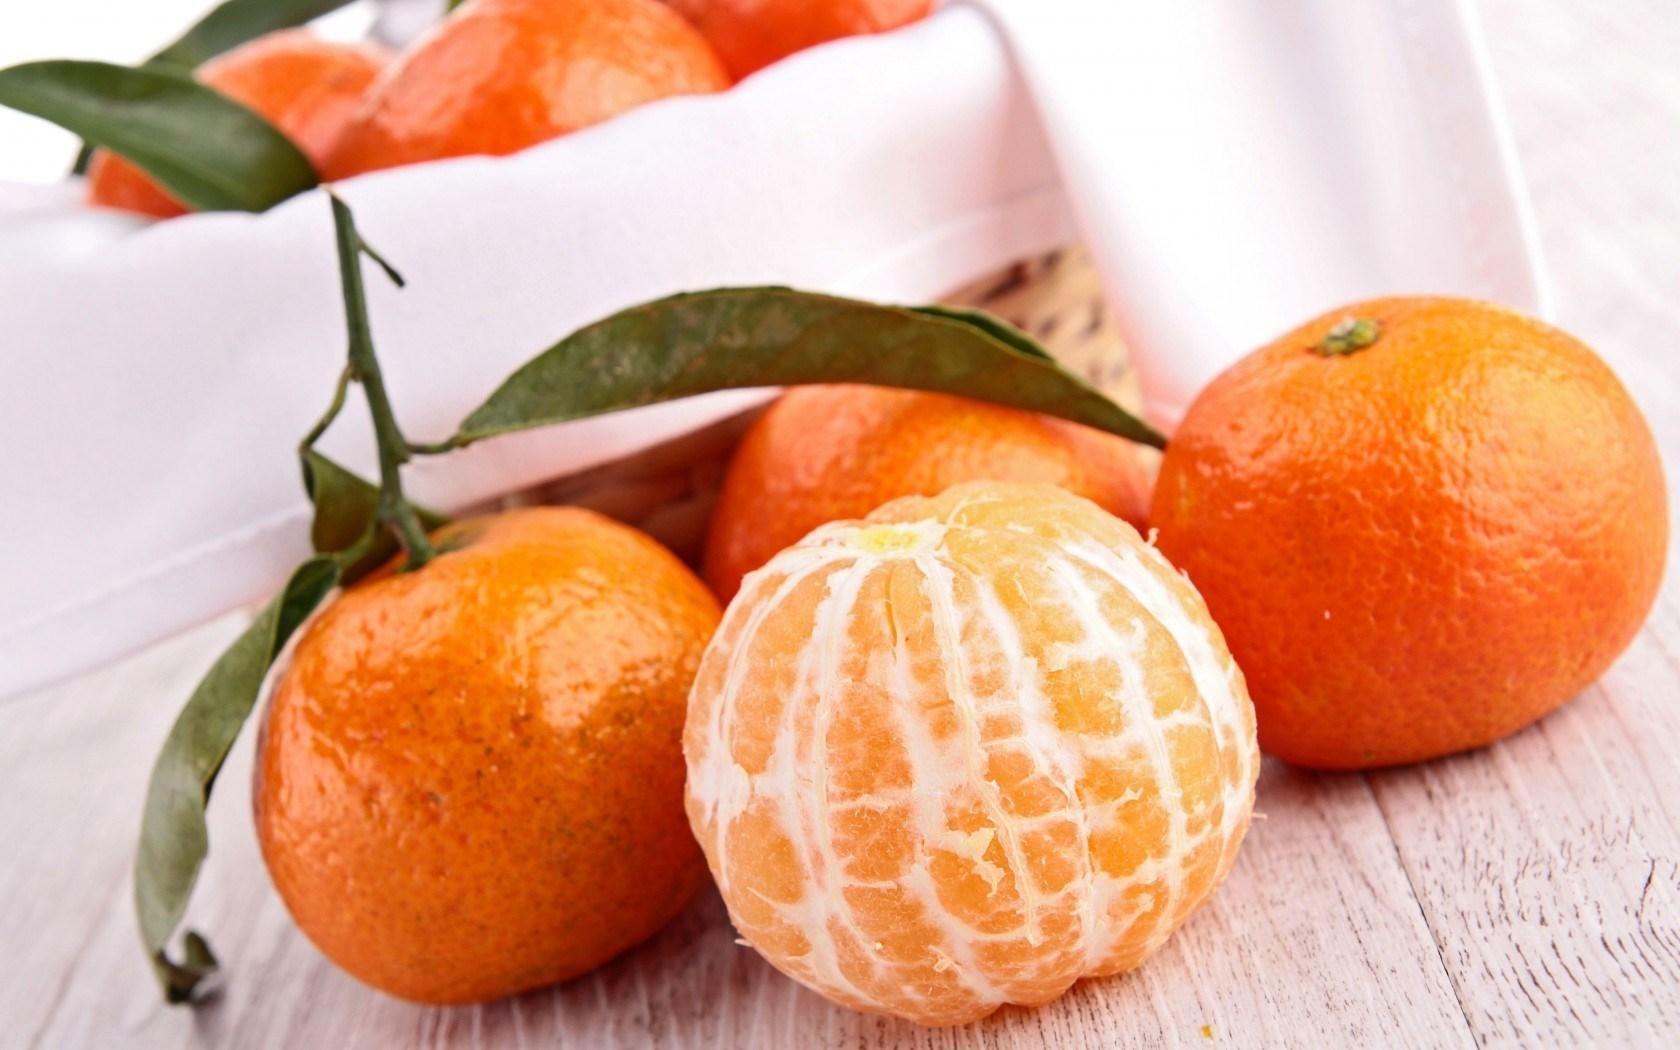 Cute Babies Orange Fruit Hd Wallpaper Free For Mobile